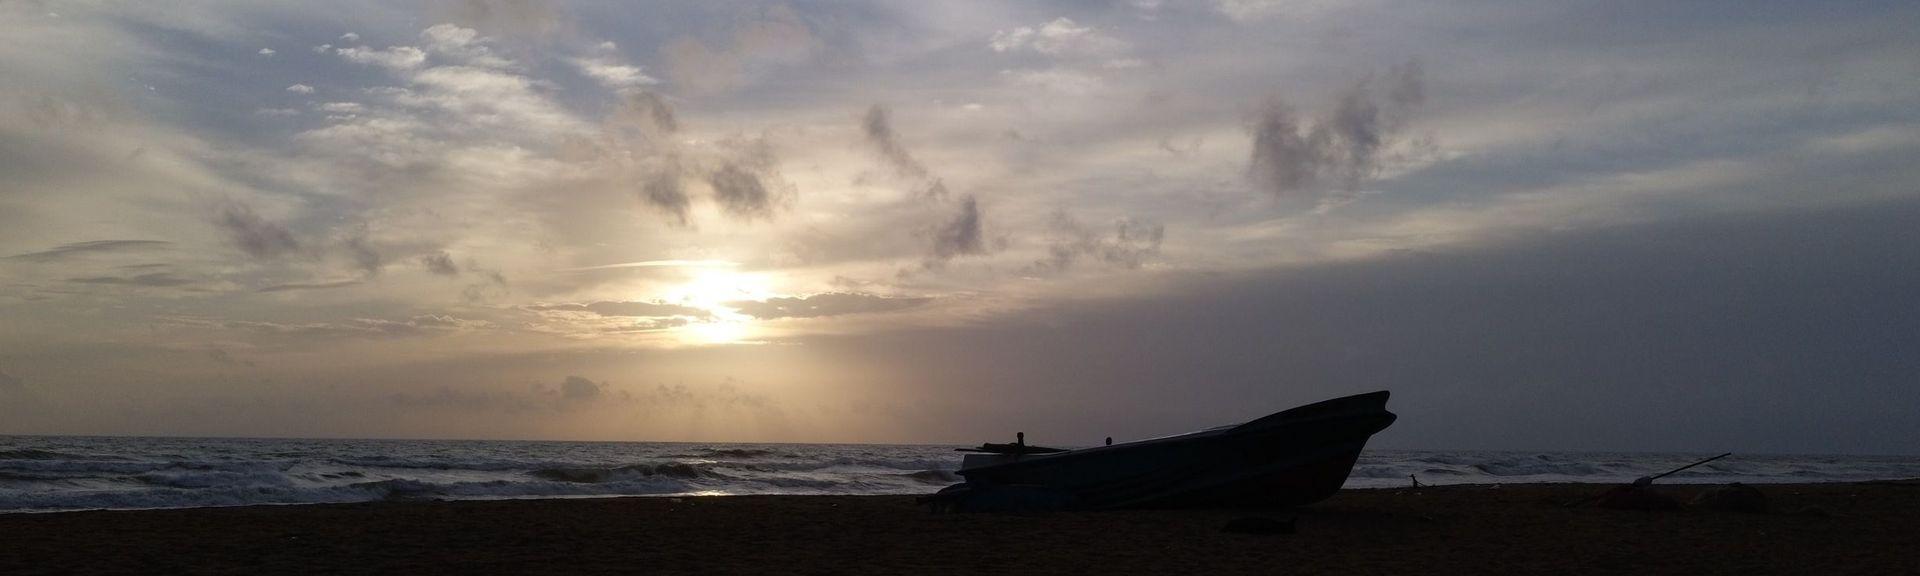 Wadduwa, Western Province, Sri Lanka